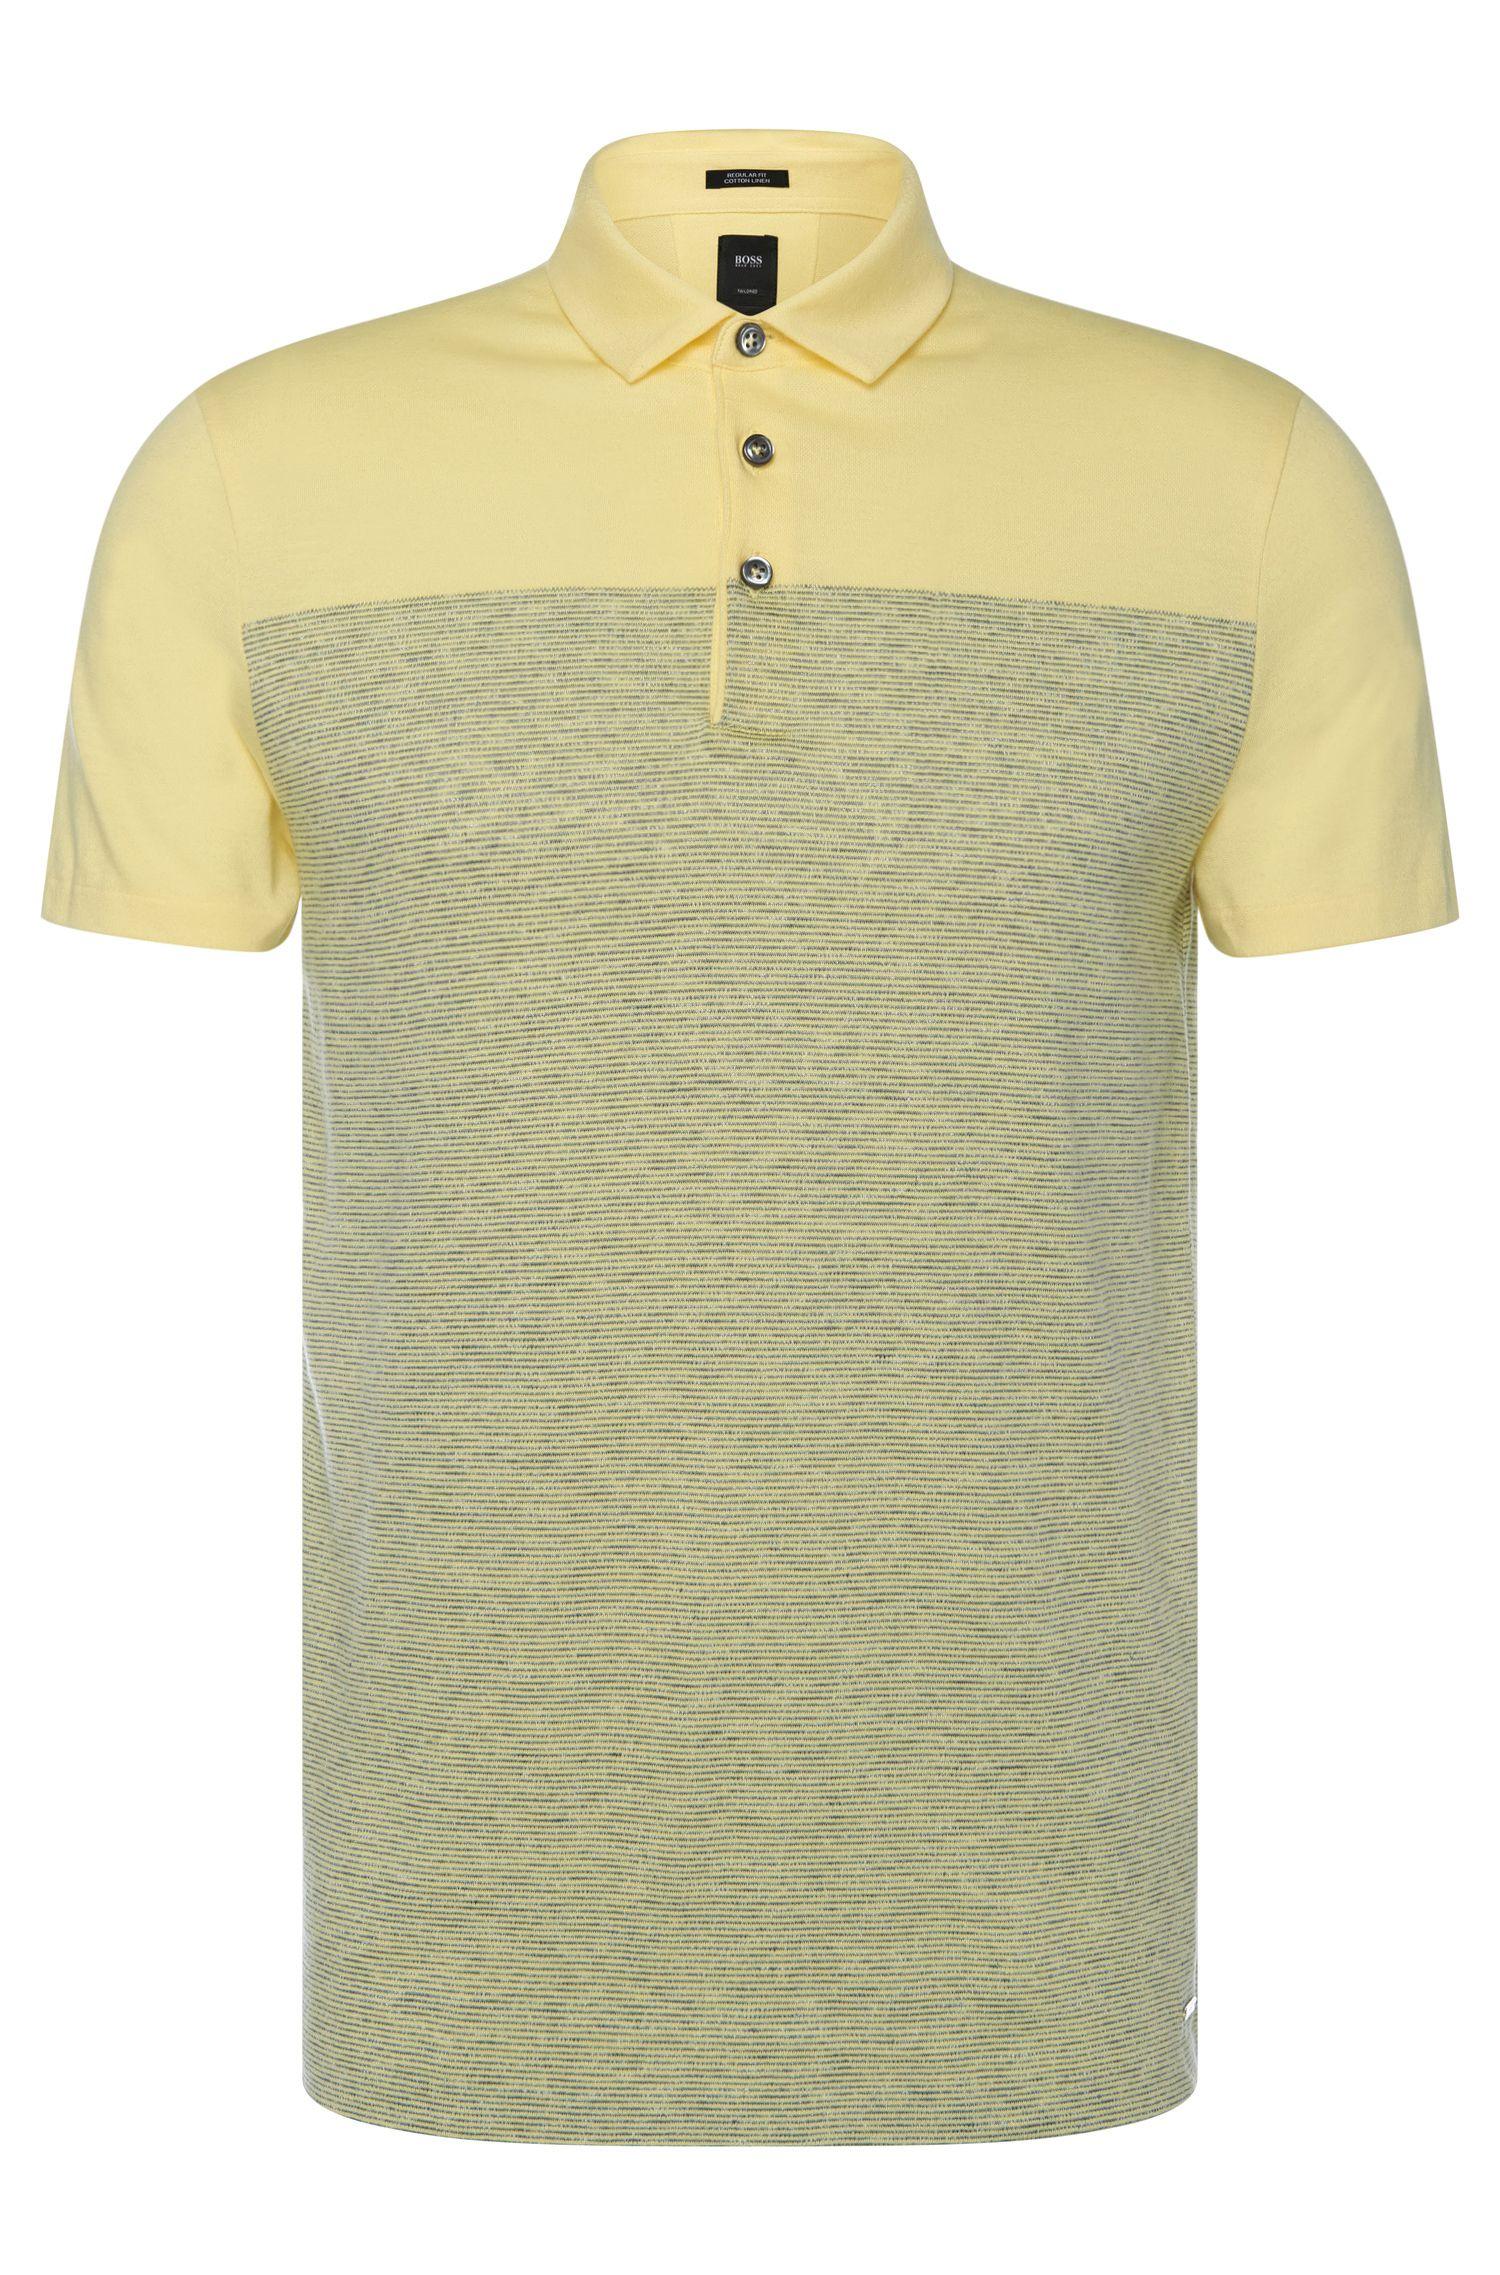 'T-Pryde' | Slim Fit, Italian Cotton Linen Blend Polo Shirt